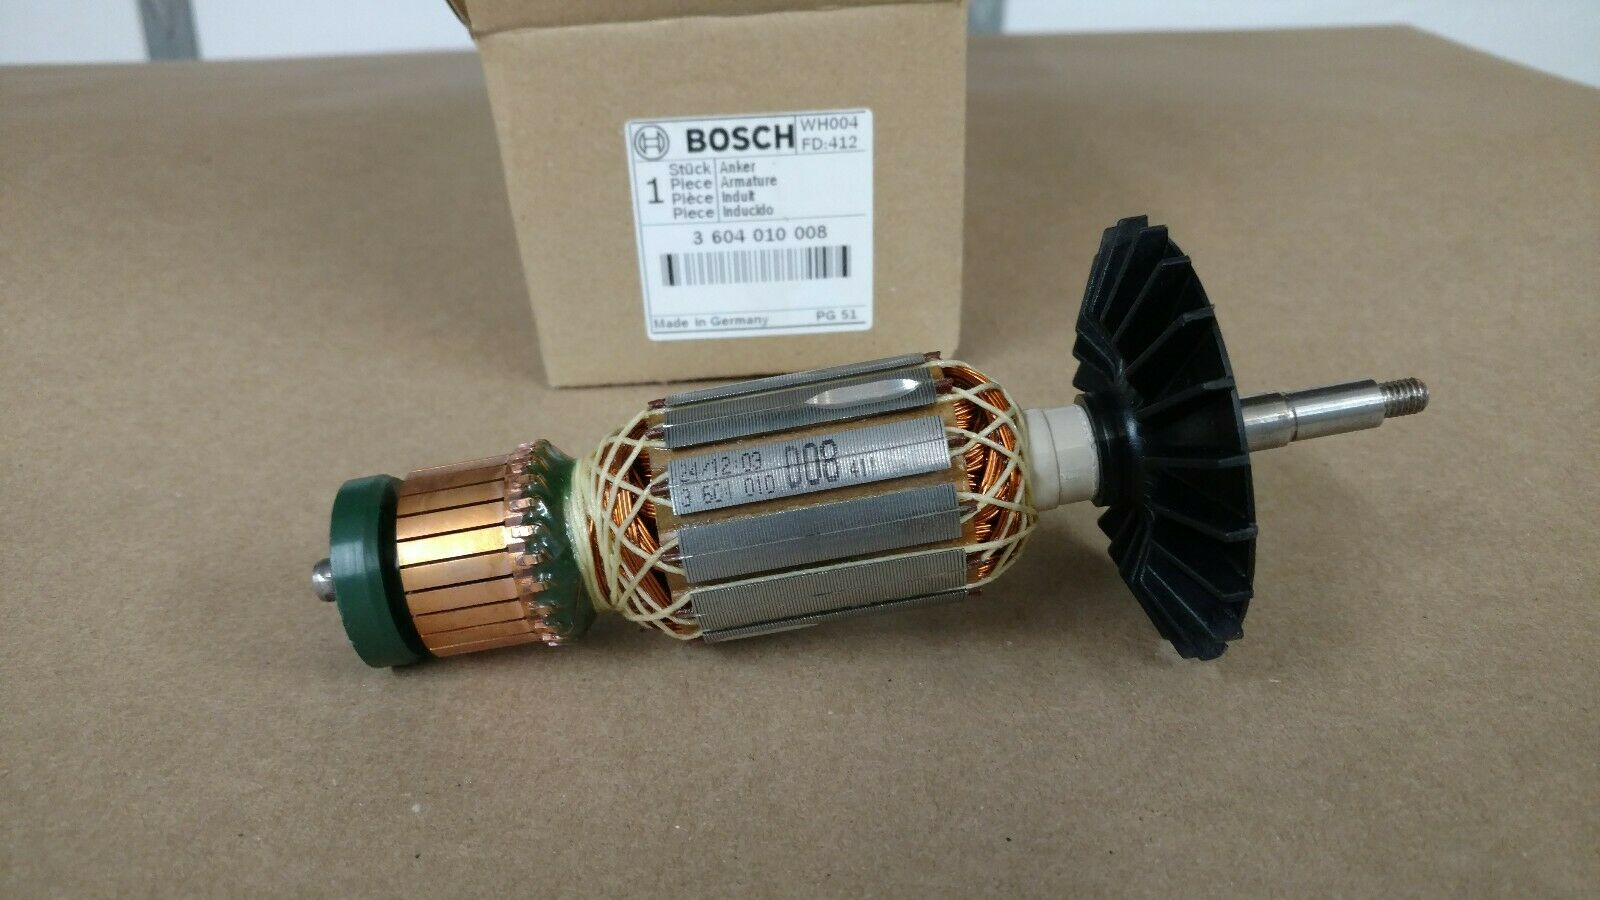 3604010008 Armature  Genuine BOSCH-SKIL-DREMEL spare-part